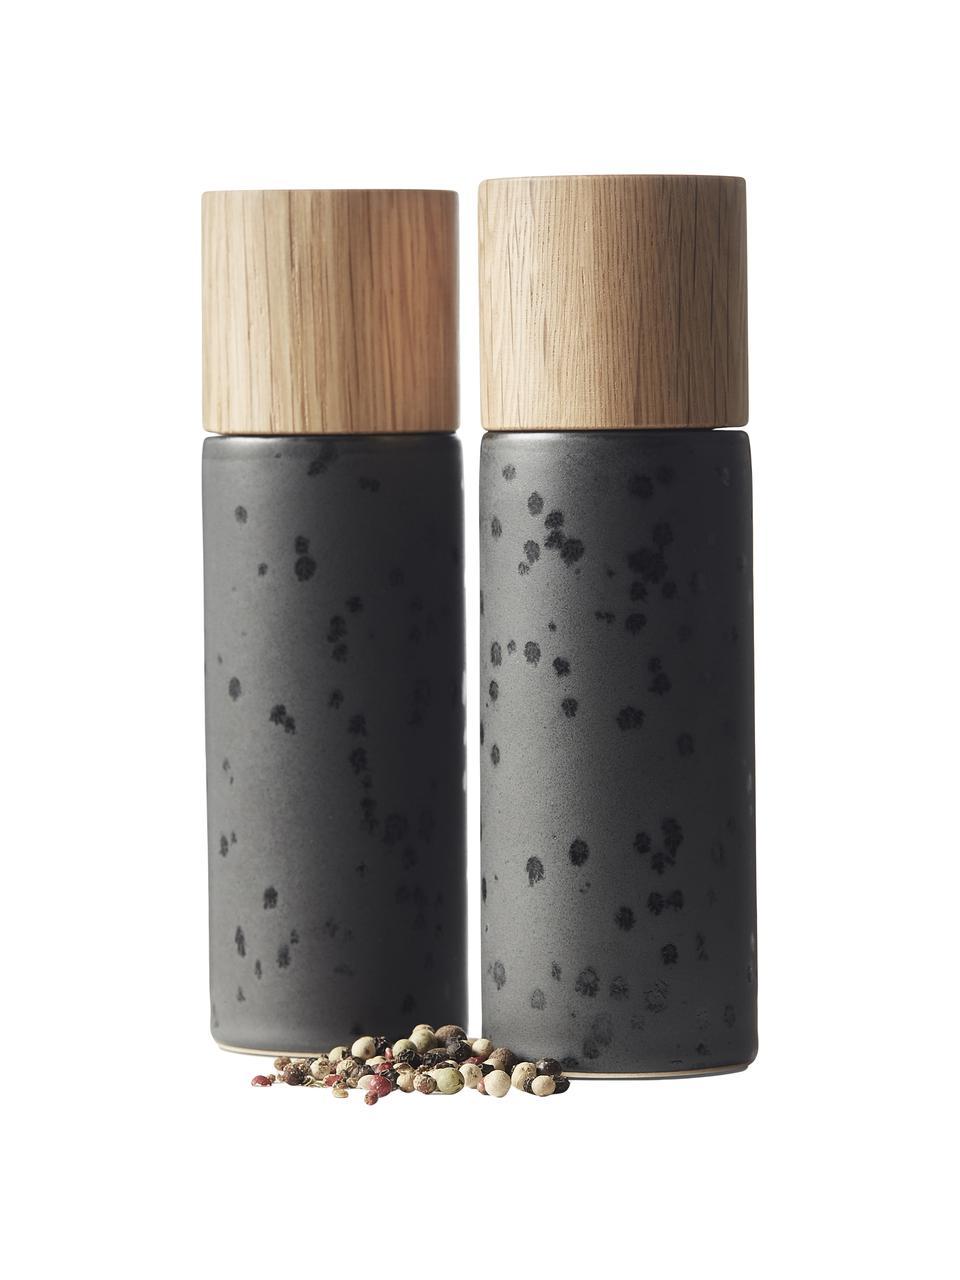 Keramiek zout- en pepermolen Bizz met houten deksel, 2-delig, Deksel: eikenhout, Zwart, beige, Ø 5 x H 17 cm